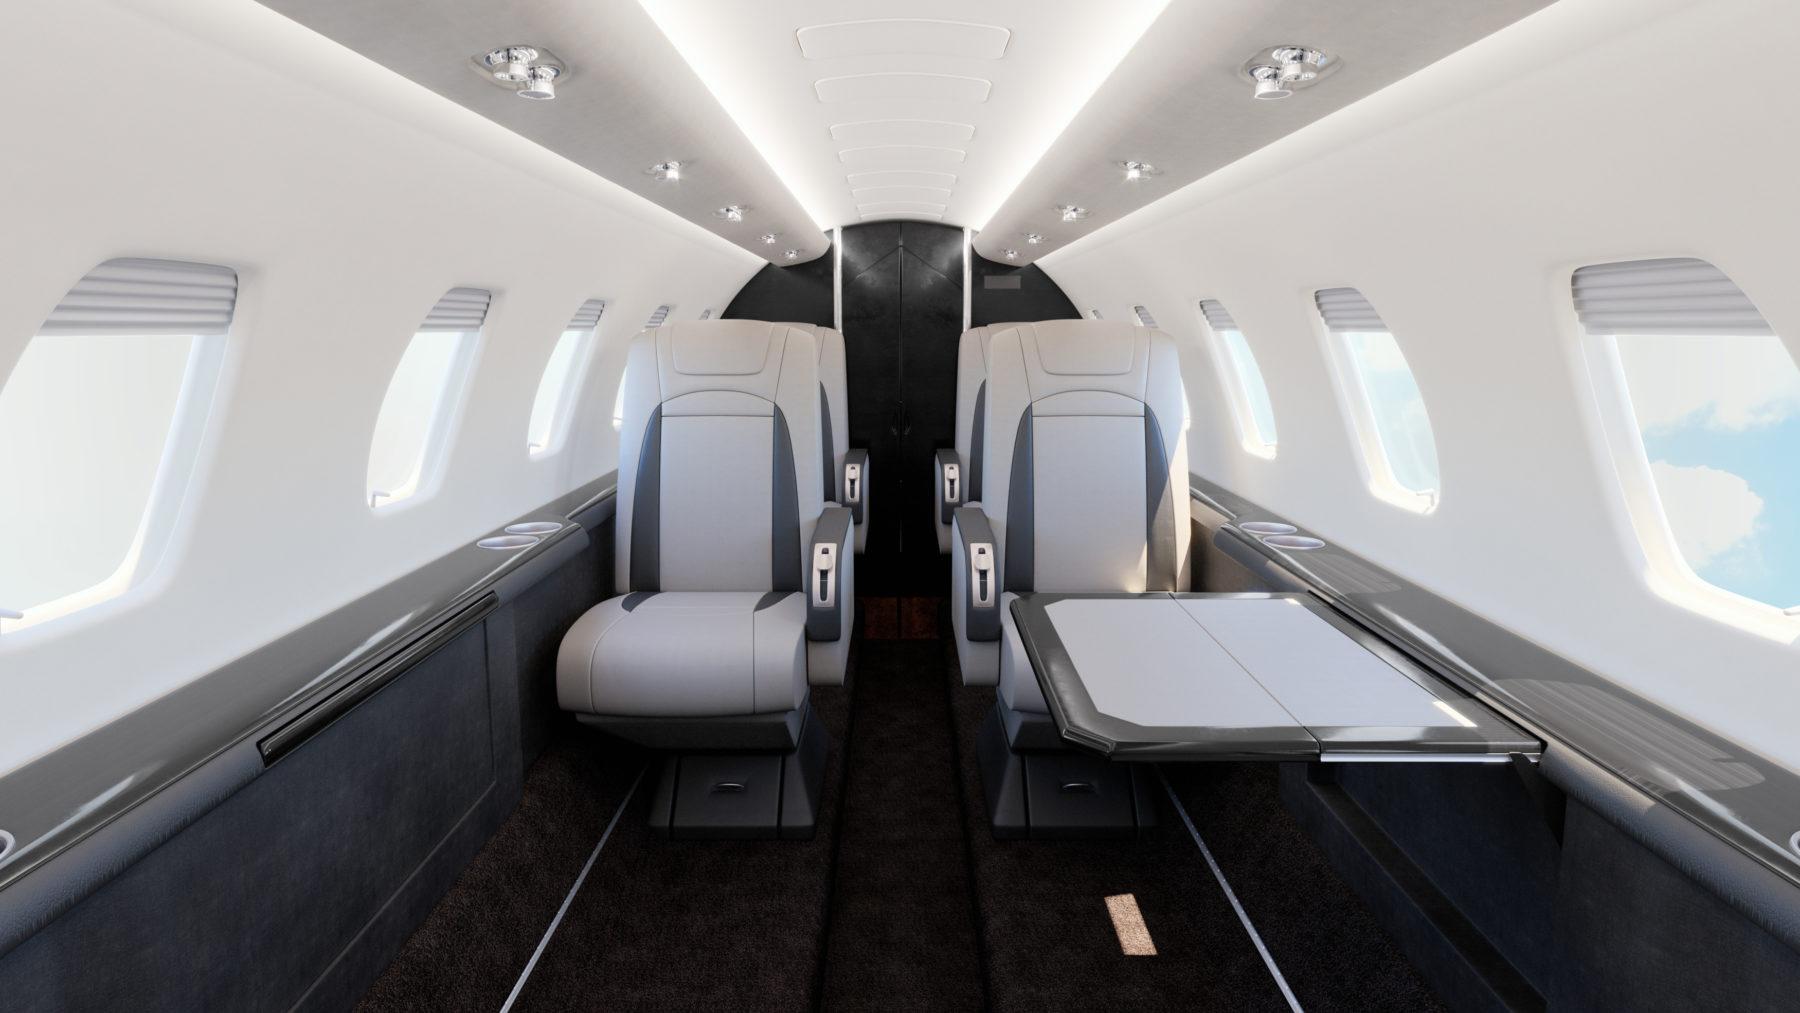 VIP Cessna Citation Encore interior rendering. Business and private aircraft interior refurbishment rendering